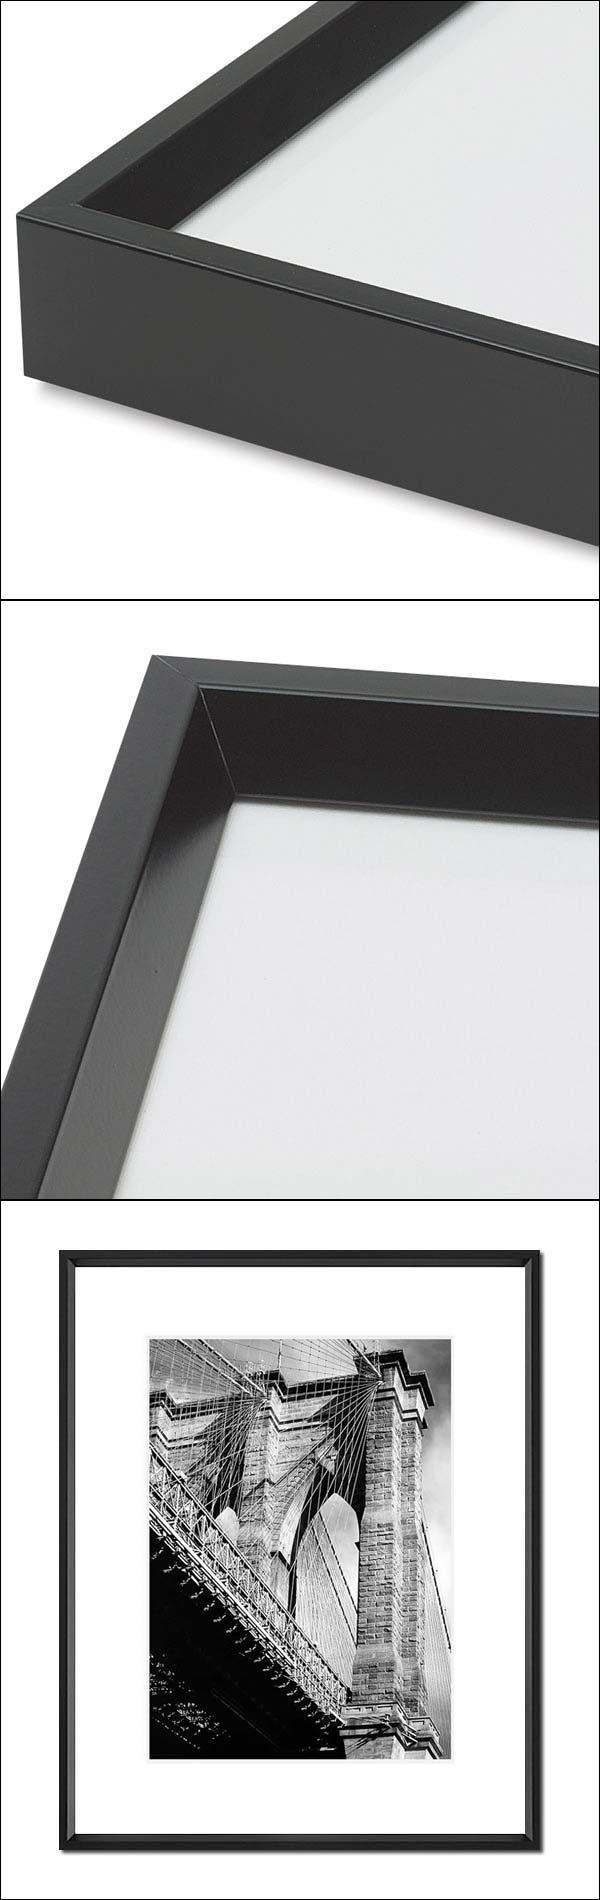 8 x 12 Frame - 8x12 Black Picture Frames